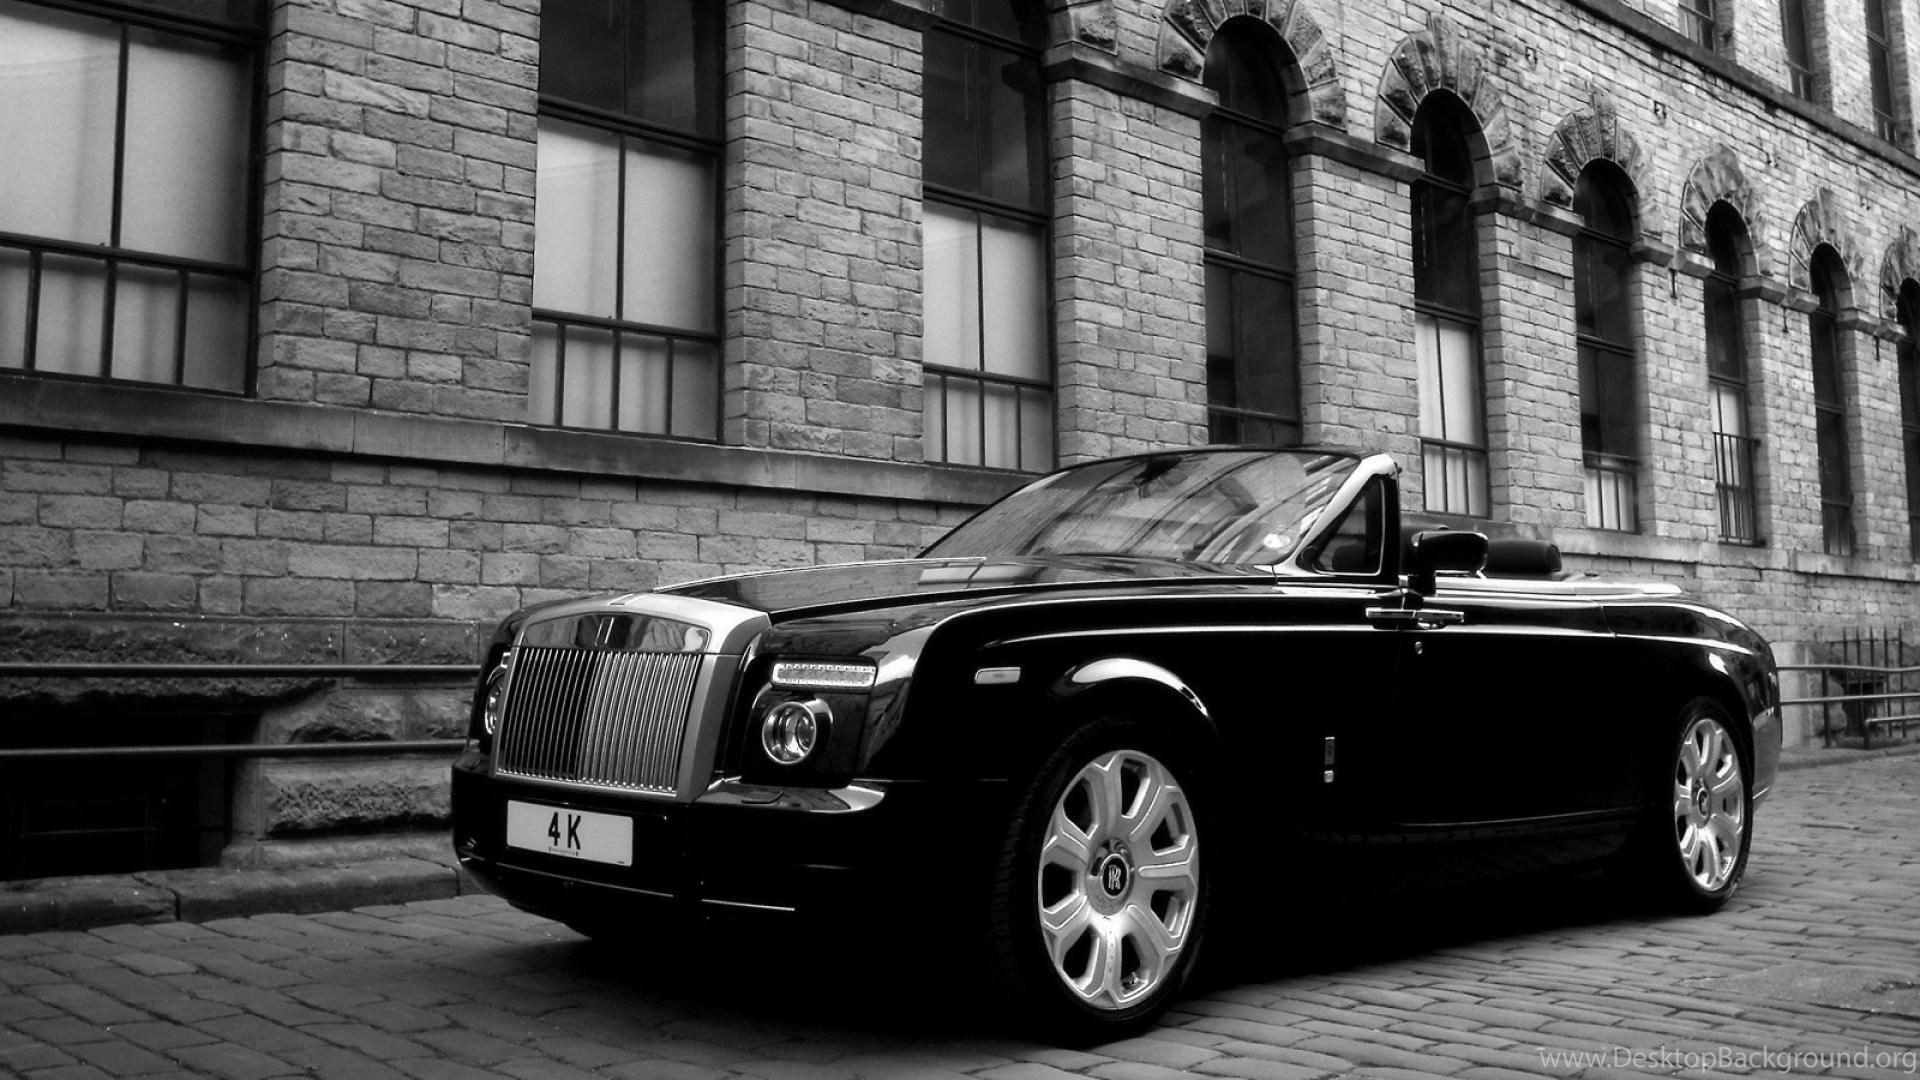 Rolls Royce Phantom Hd Wallpapers Desktop Background